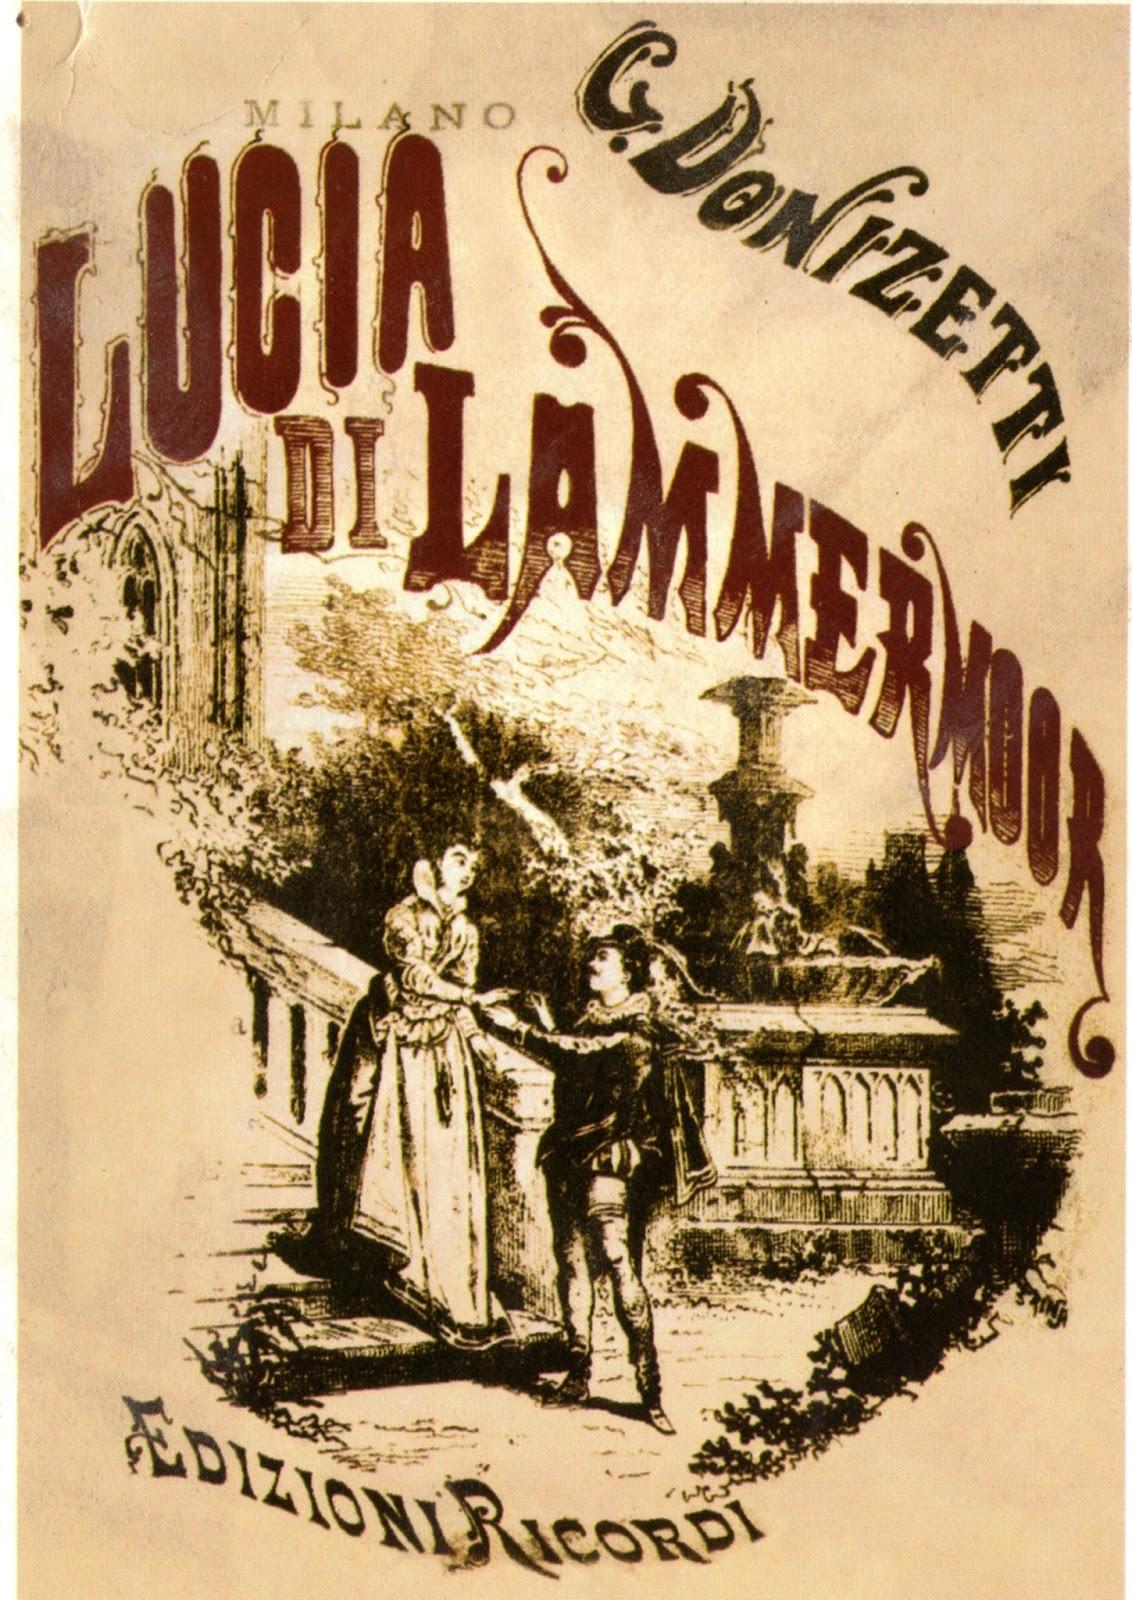 Postal-Ricordi-Lucia-di-Lammermoor